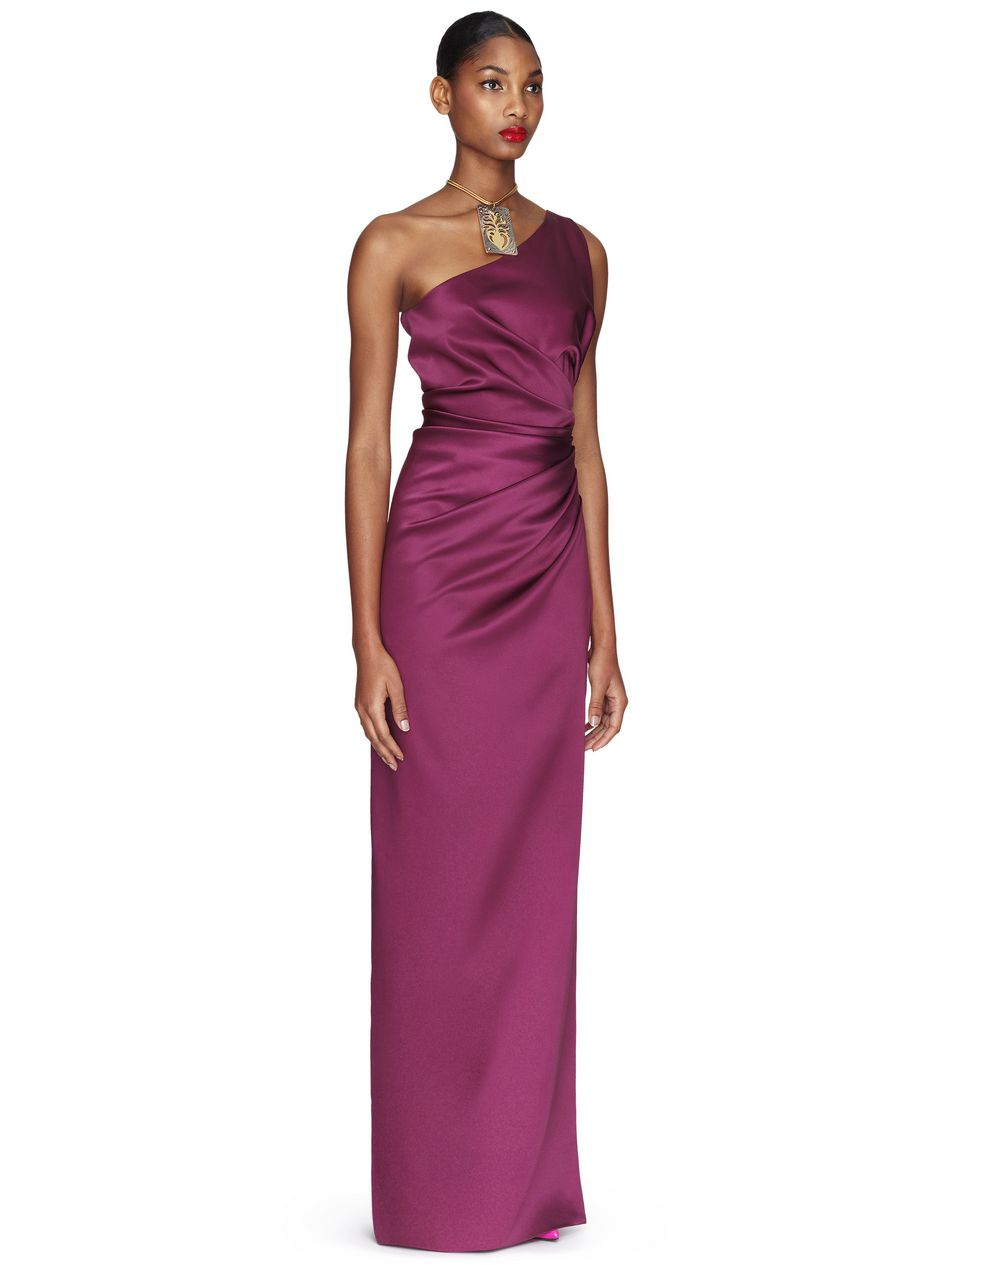 LONG PURPLE SLIT DRESS - Lanvin